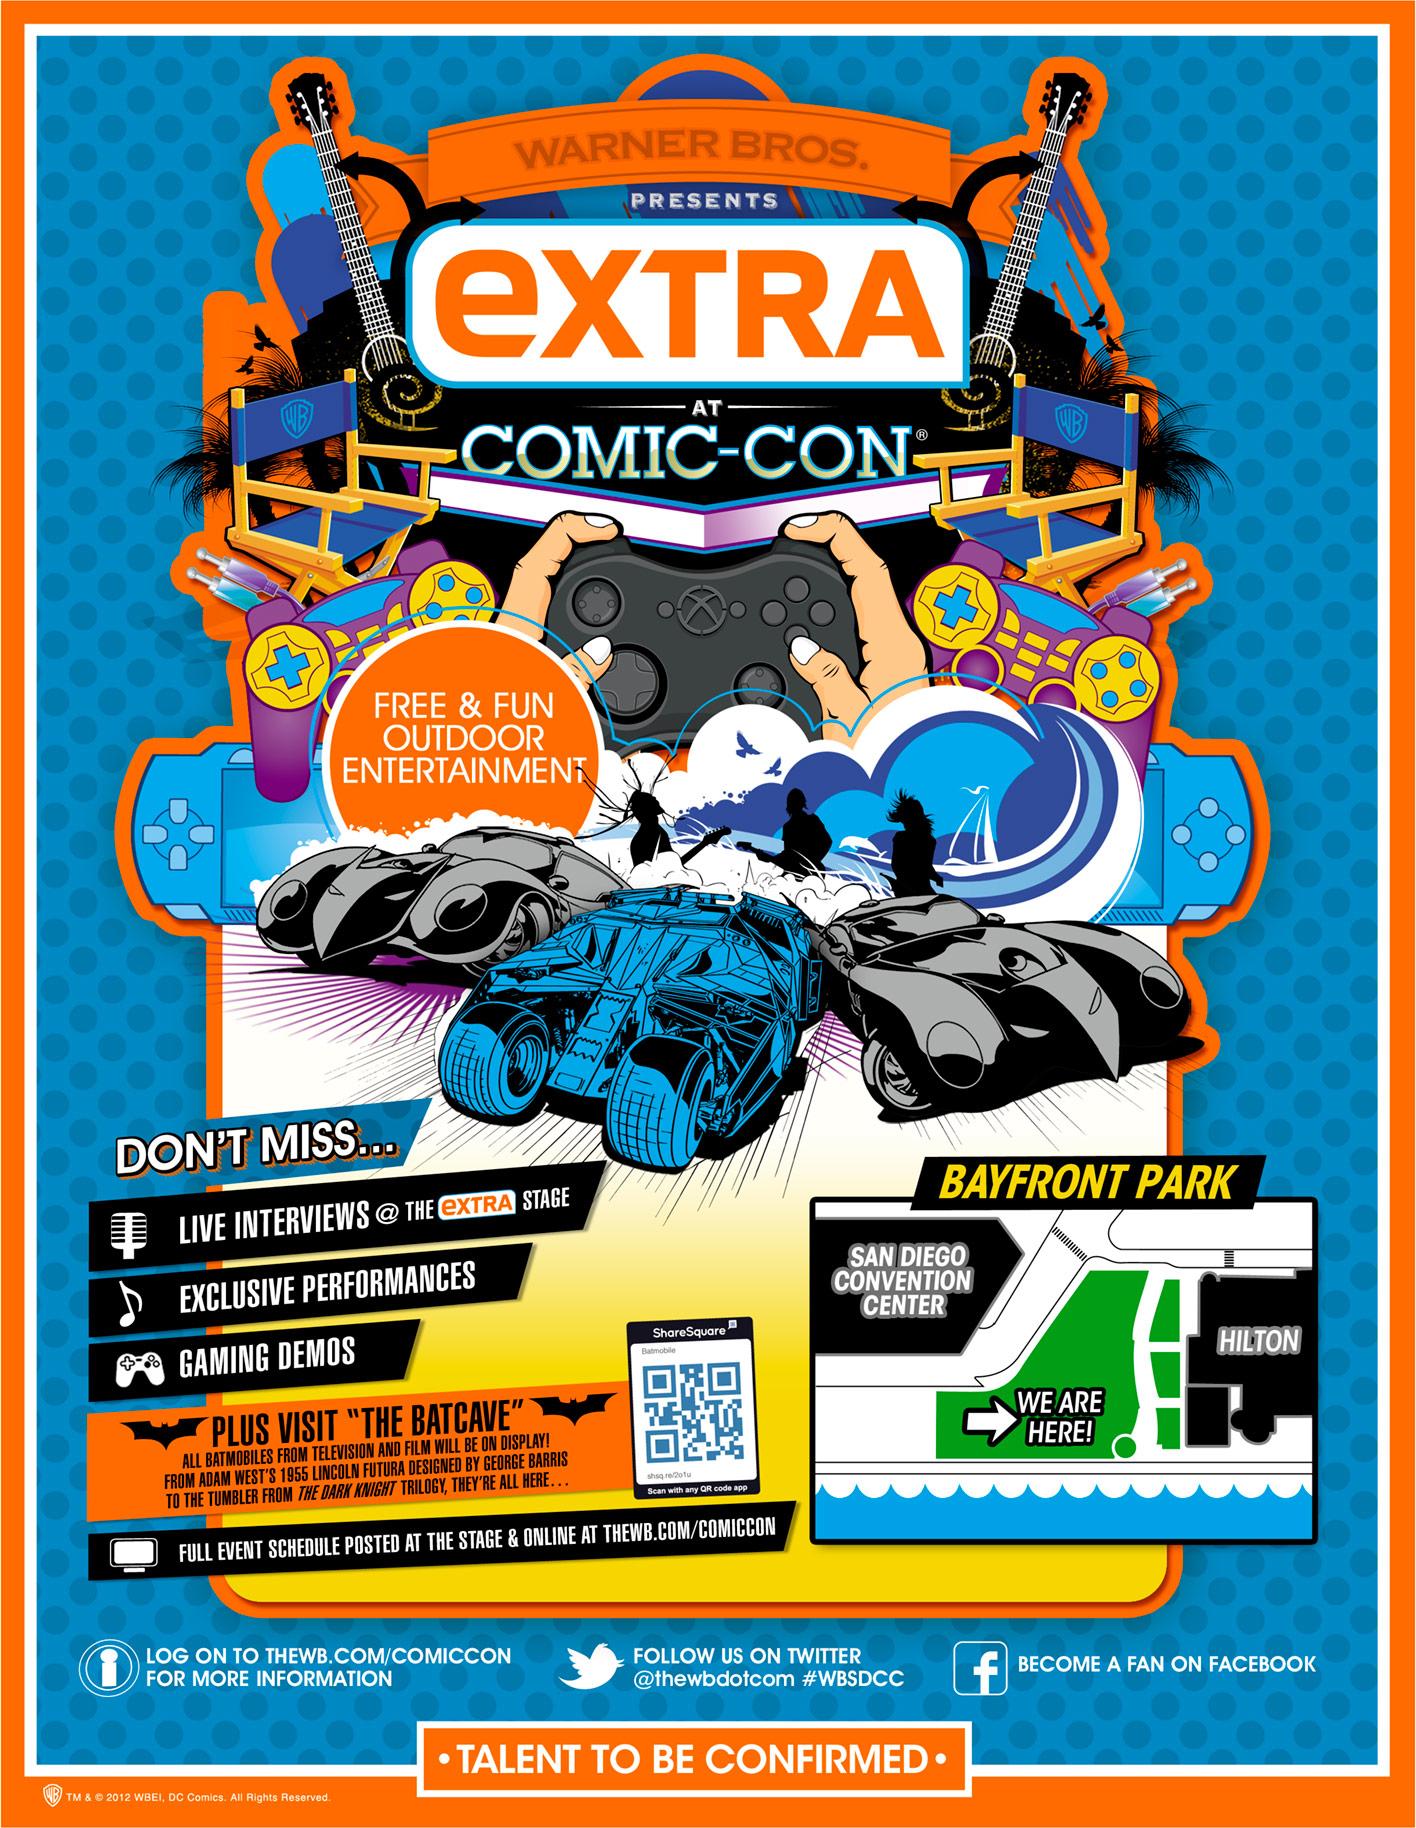 Warner Bros. Extra SDCC Promo